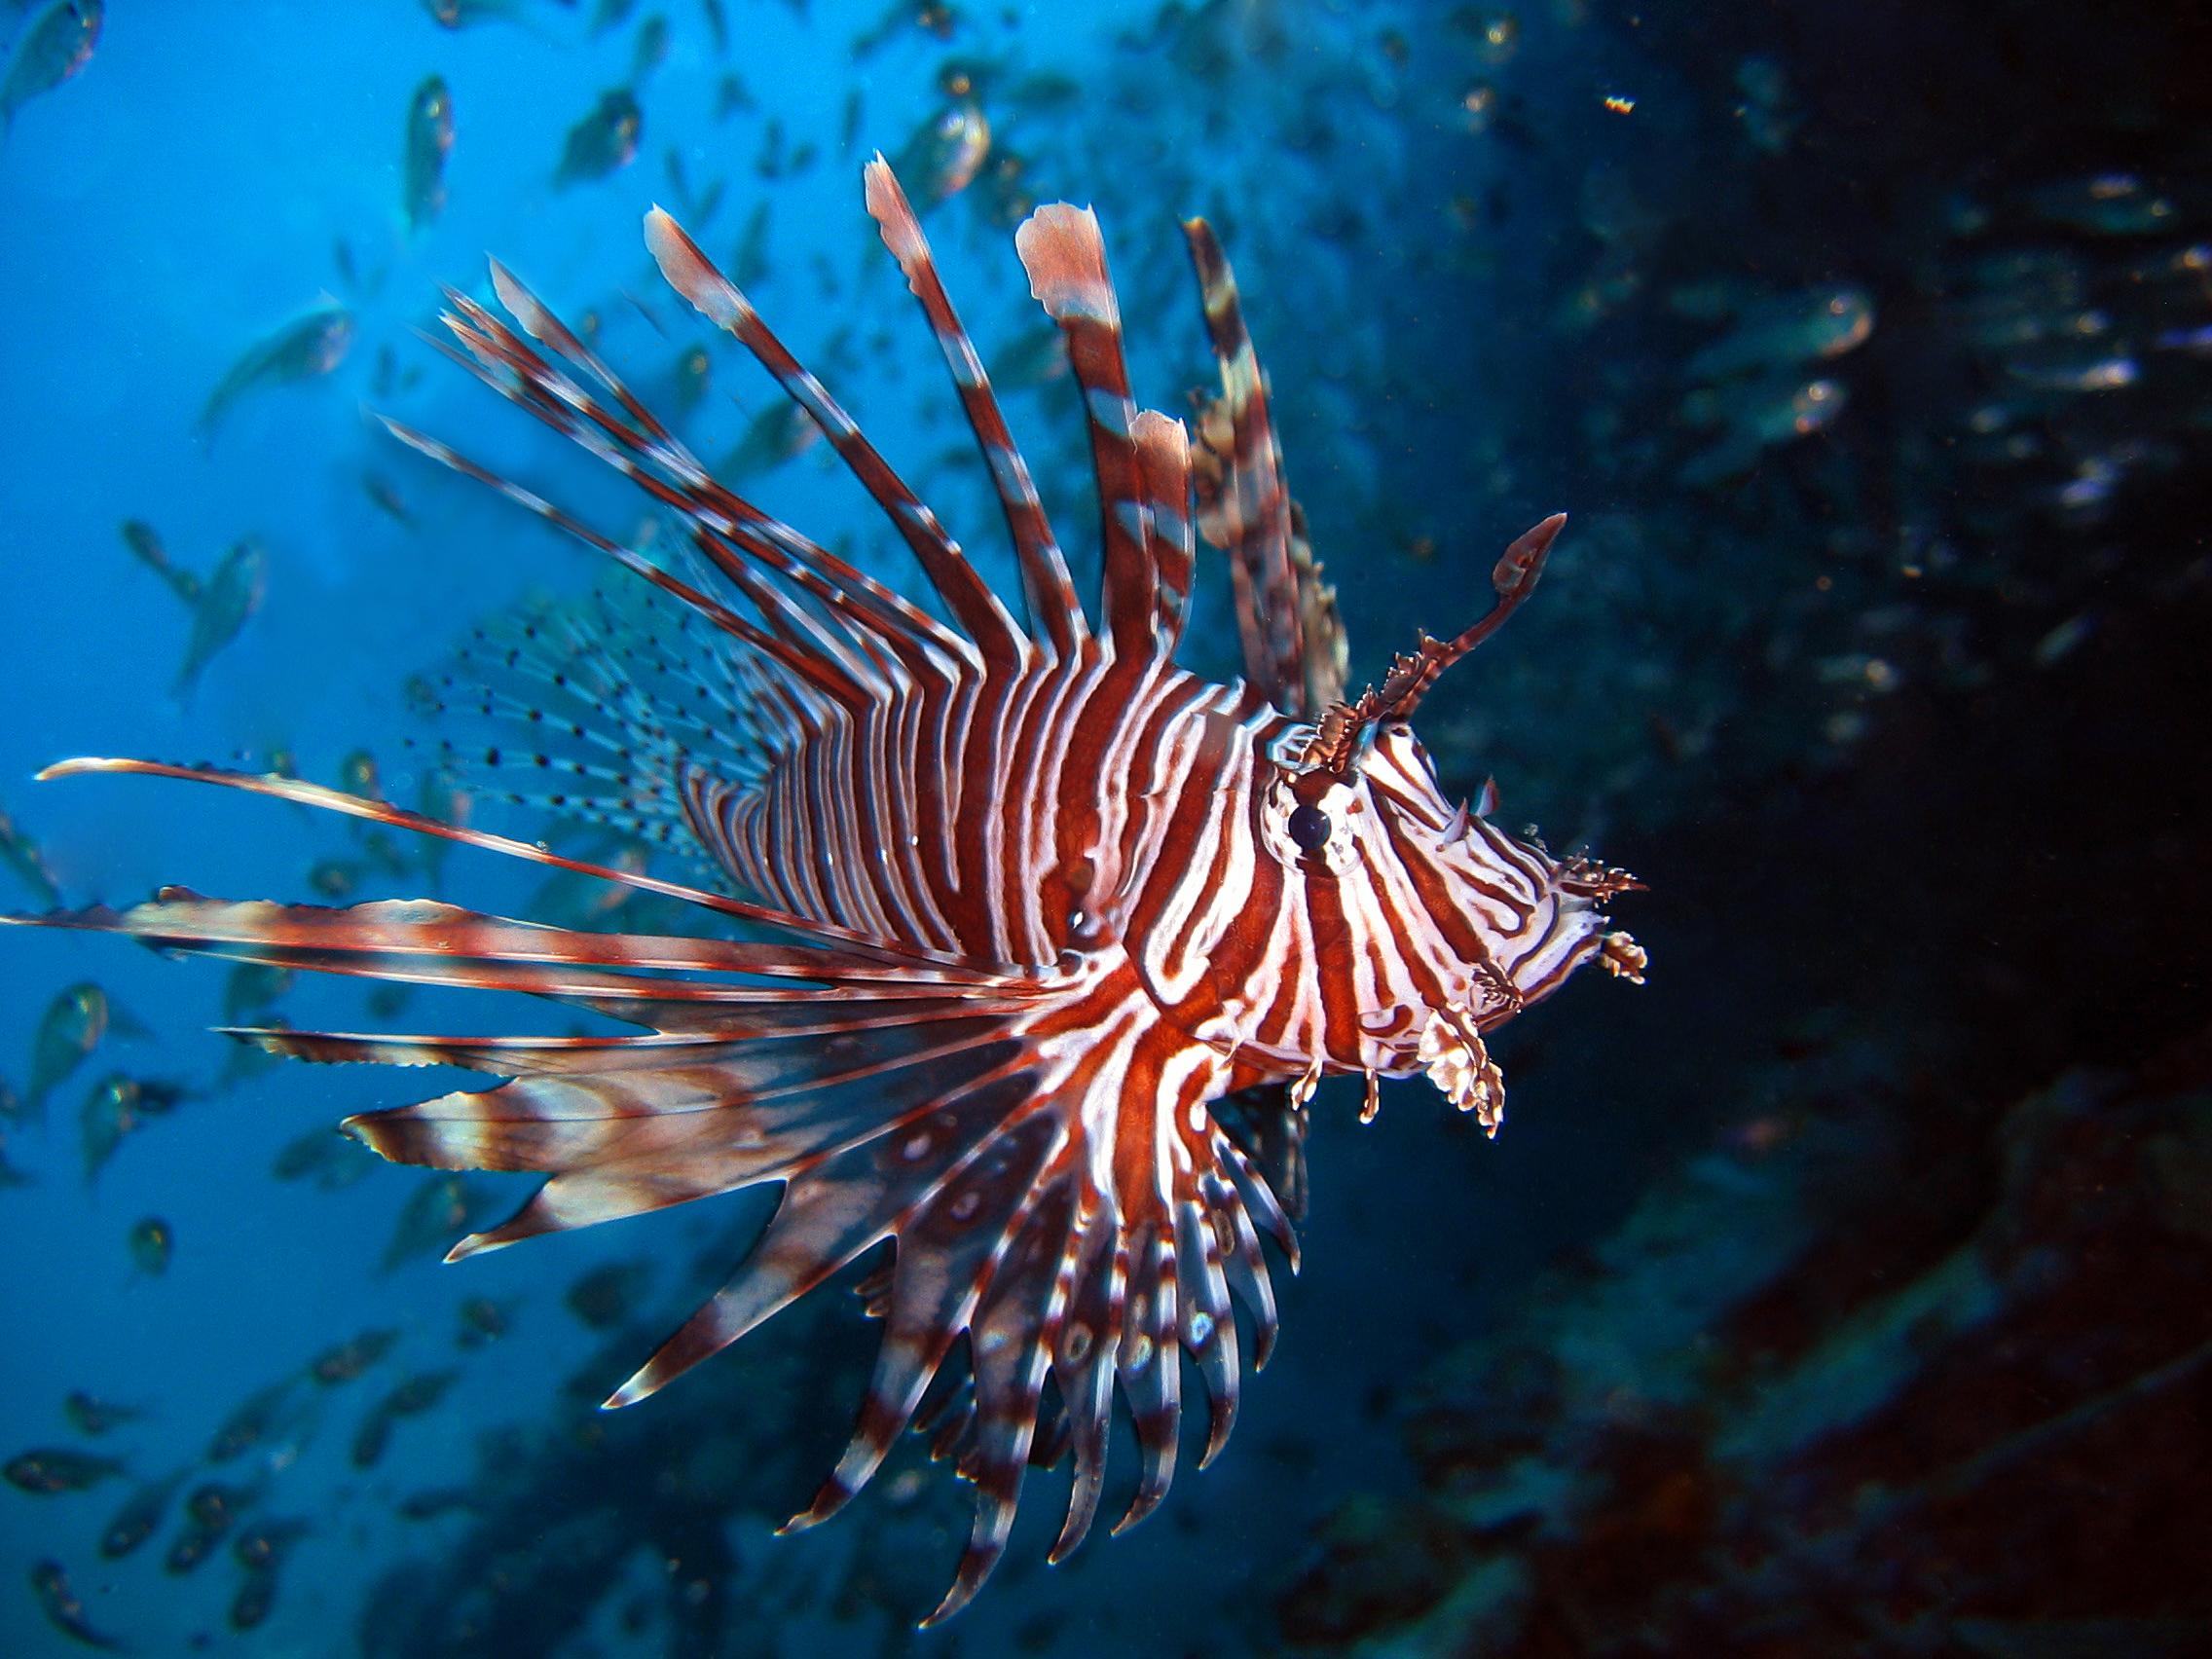 Lionfish swims wallpaper